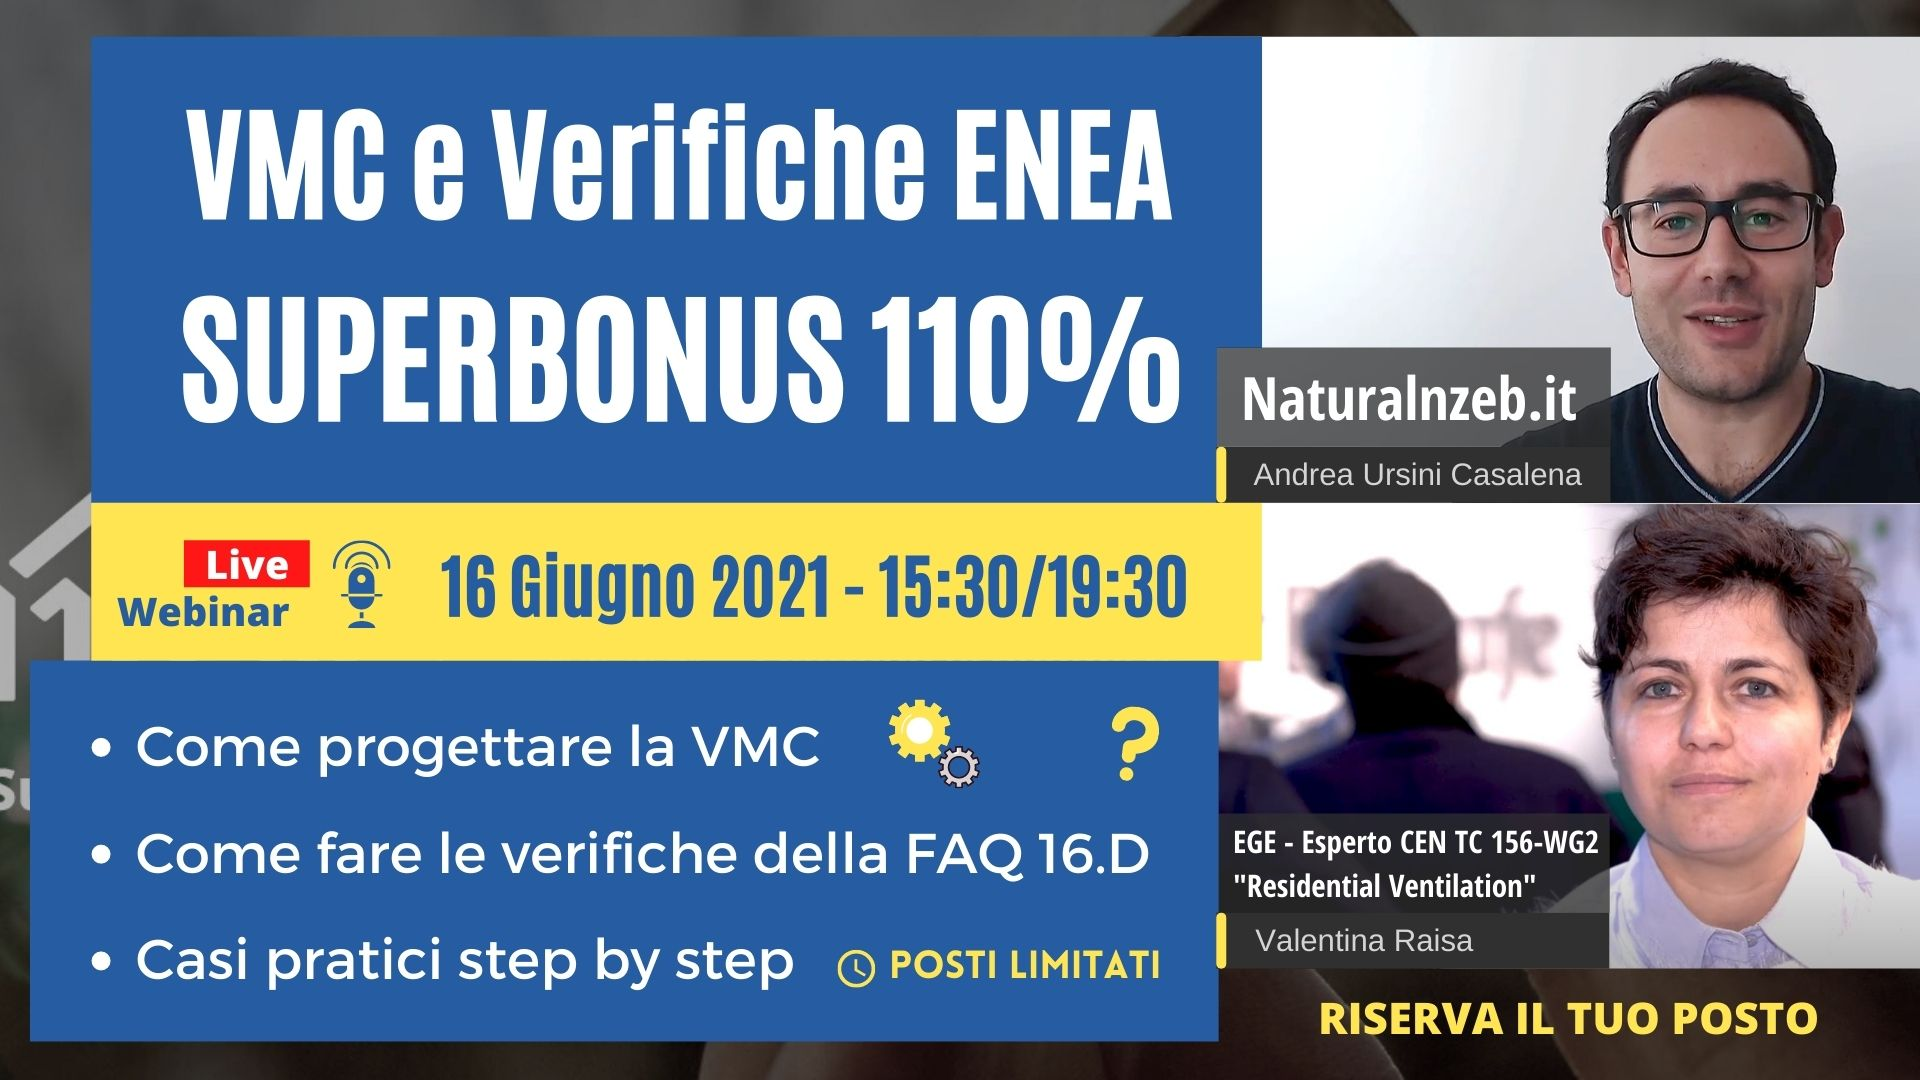 VMC Superbonus 110% Verifiche ENEA